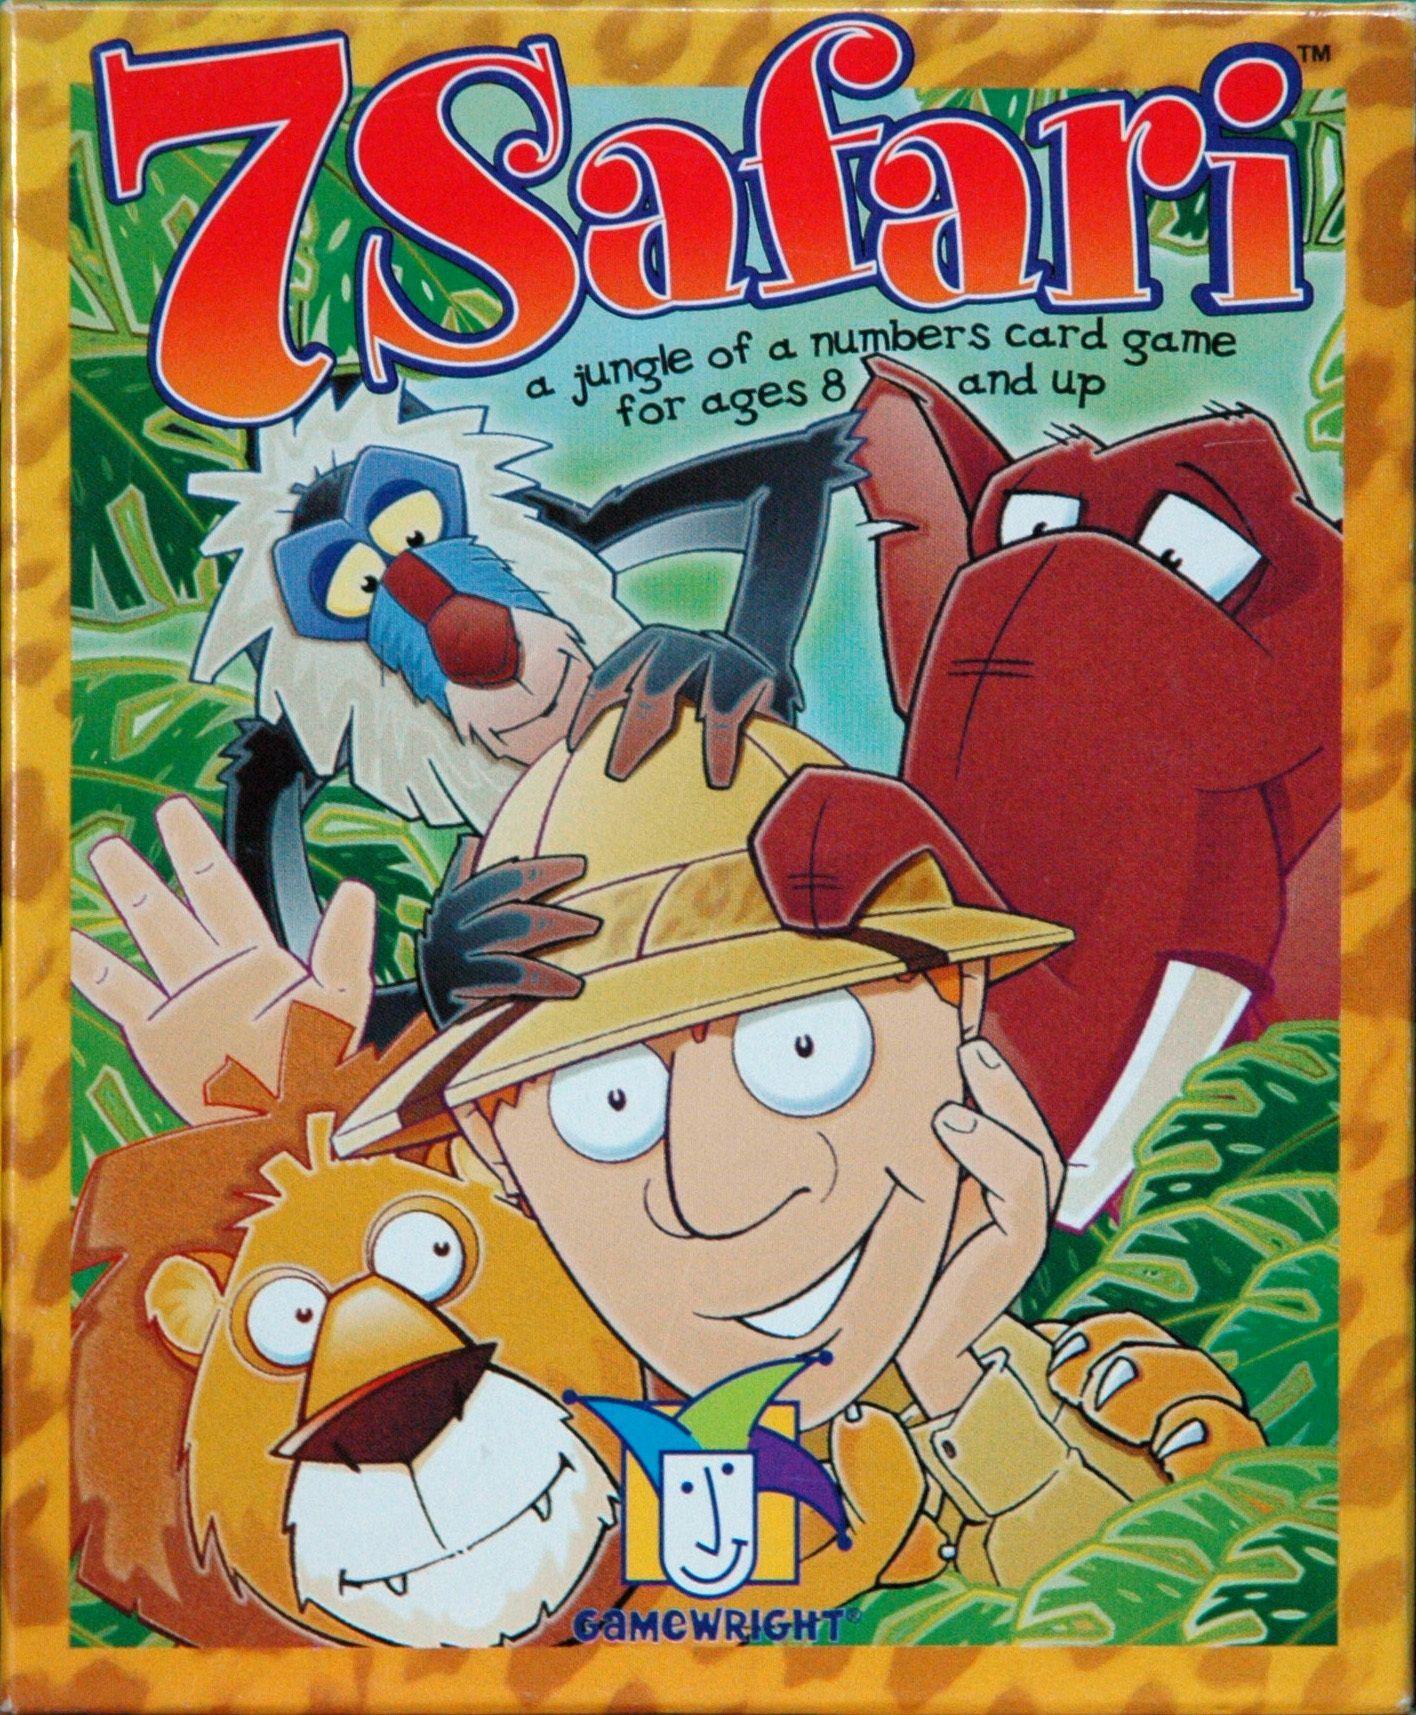 7 Safari